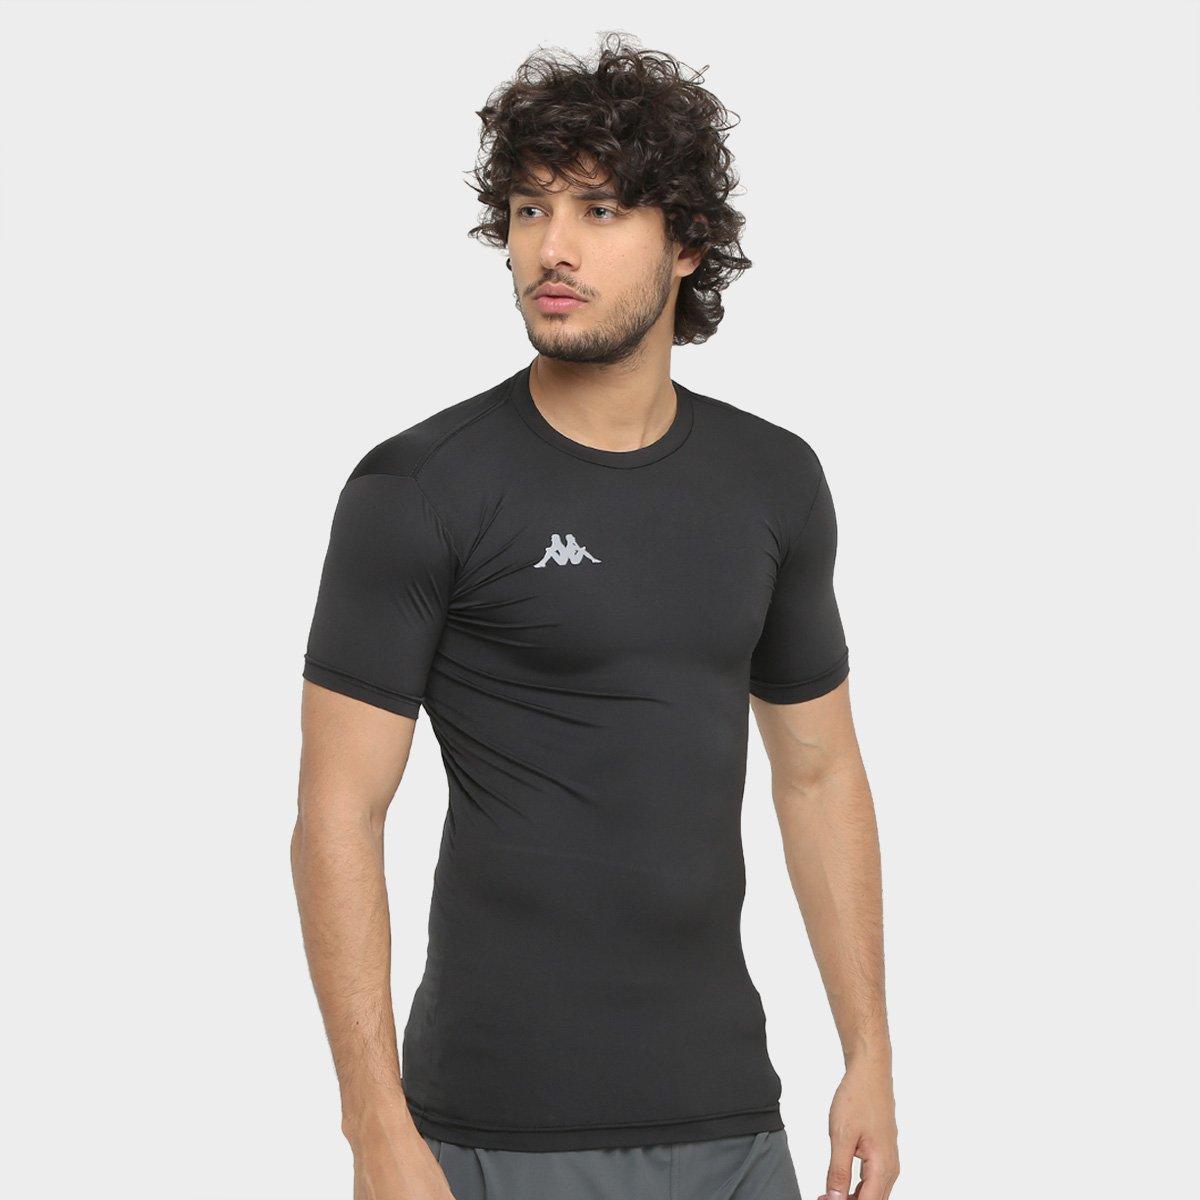 Camiseta Kappa Térmica Embrace Masculina - Preto - Compre Agora ... b2c9c9490bfb3